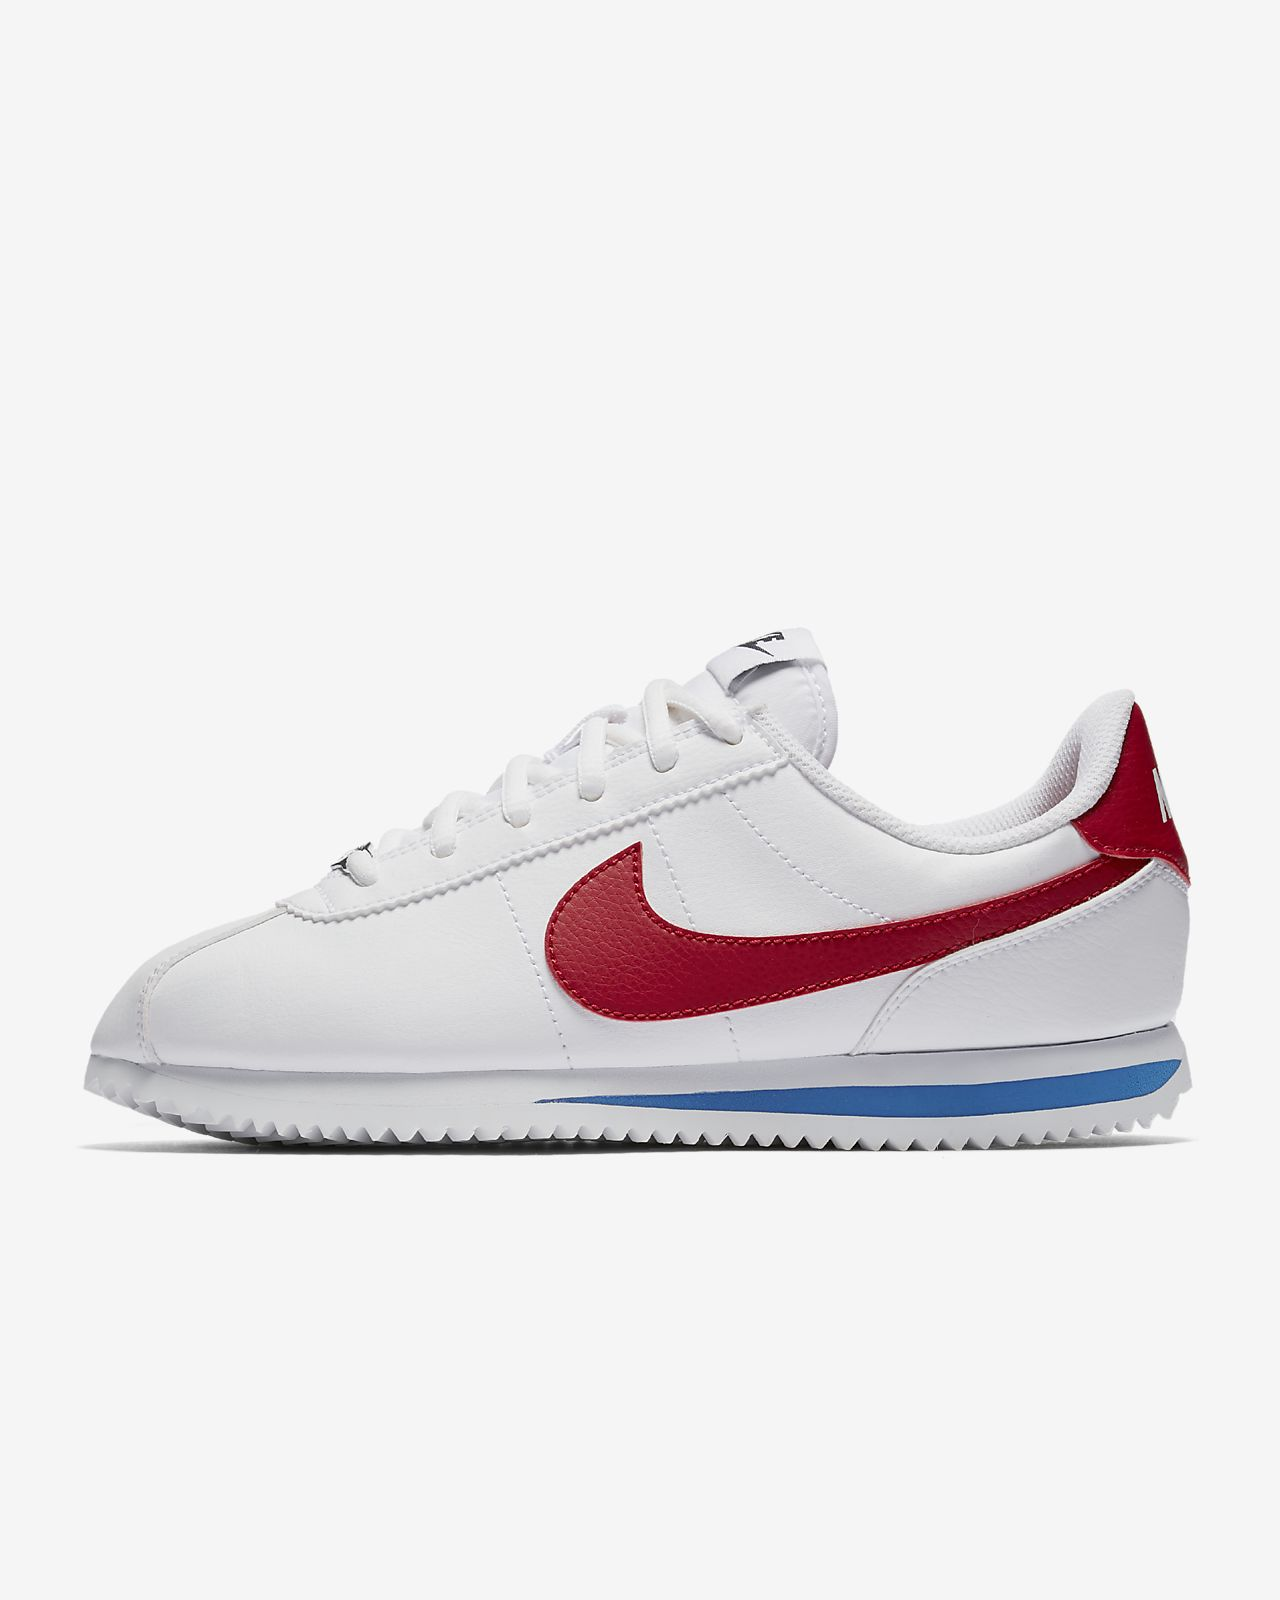 Für Basic Schuh Sl Kinder Nike Cortez Ältere hQrdts